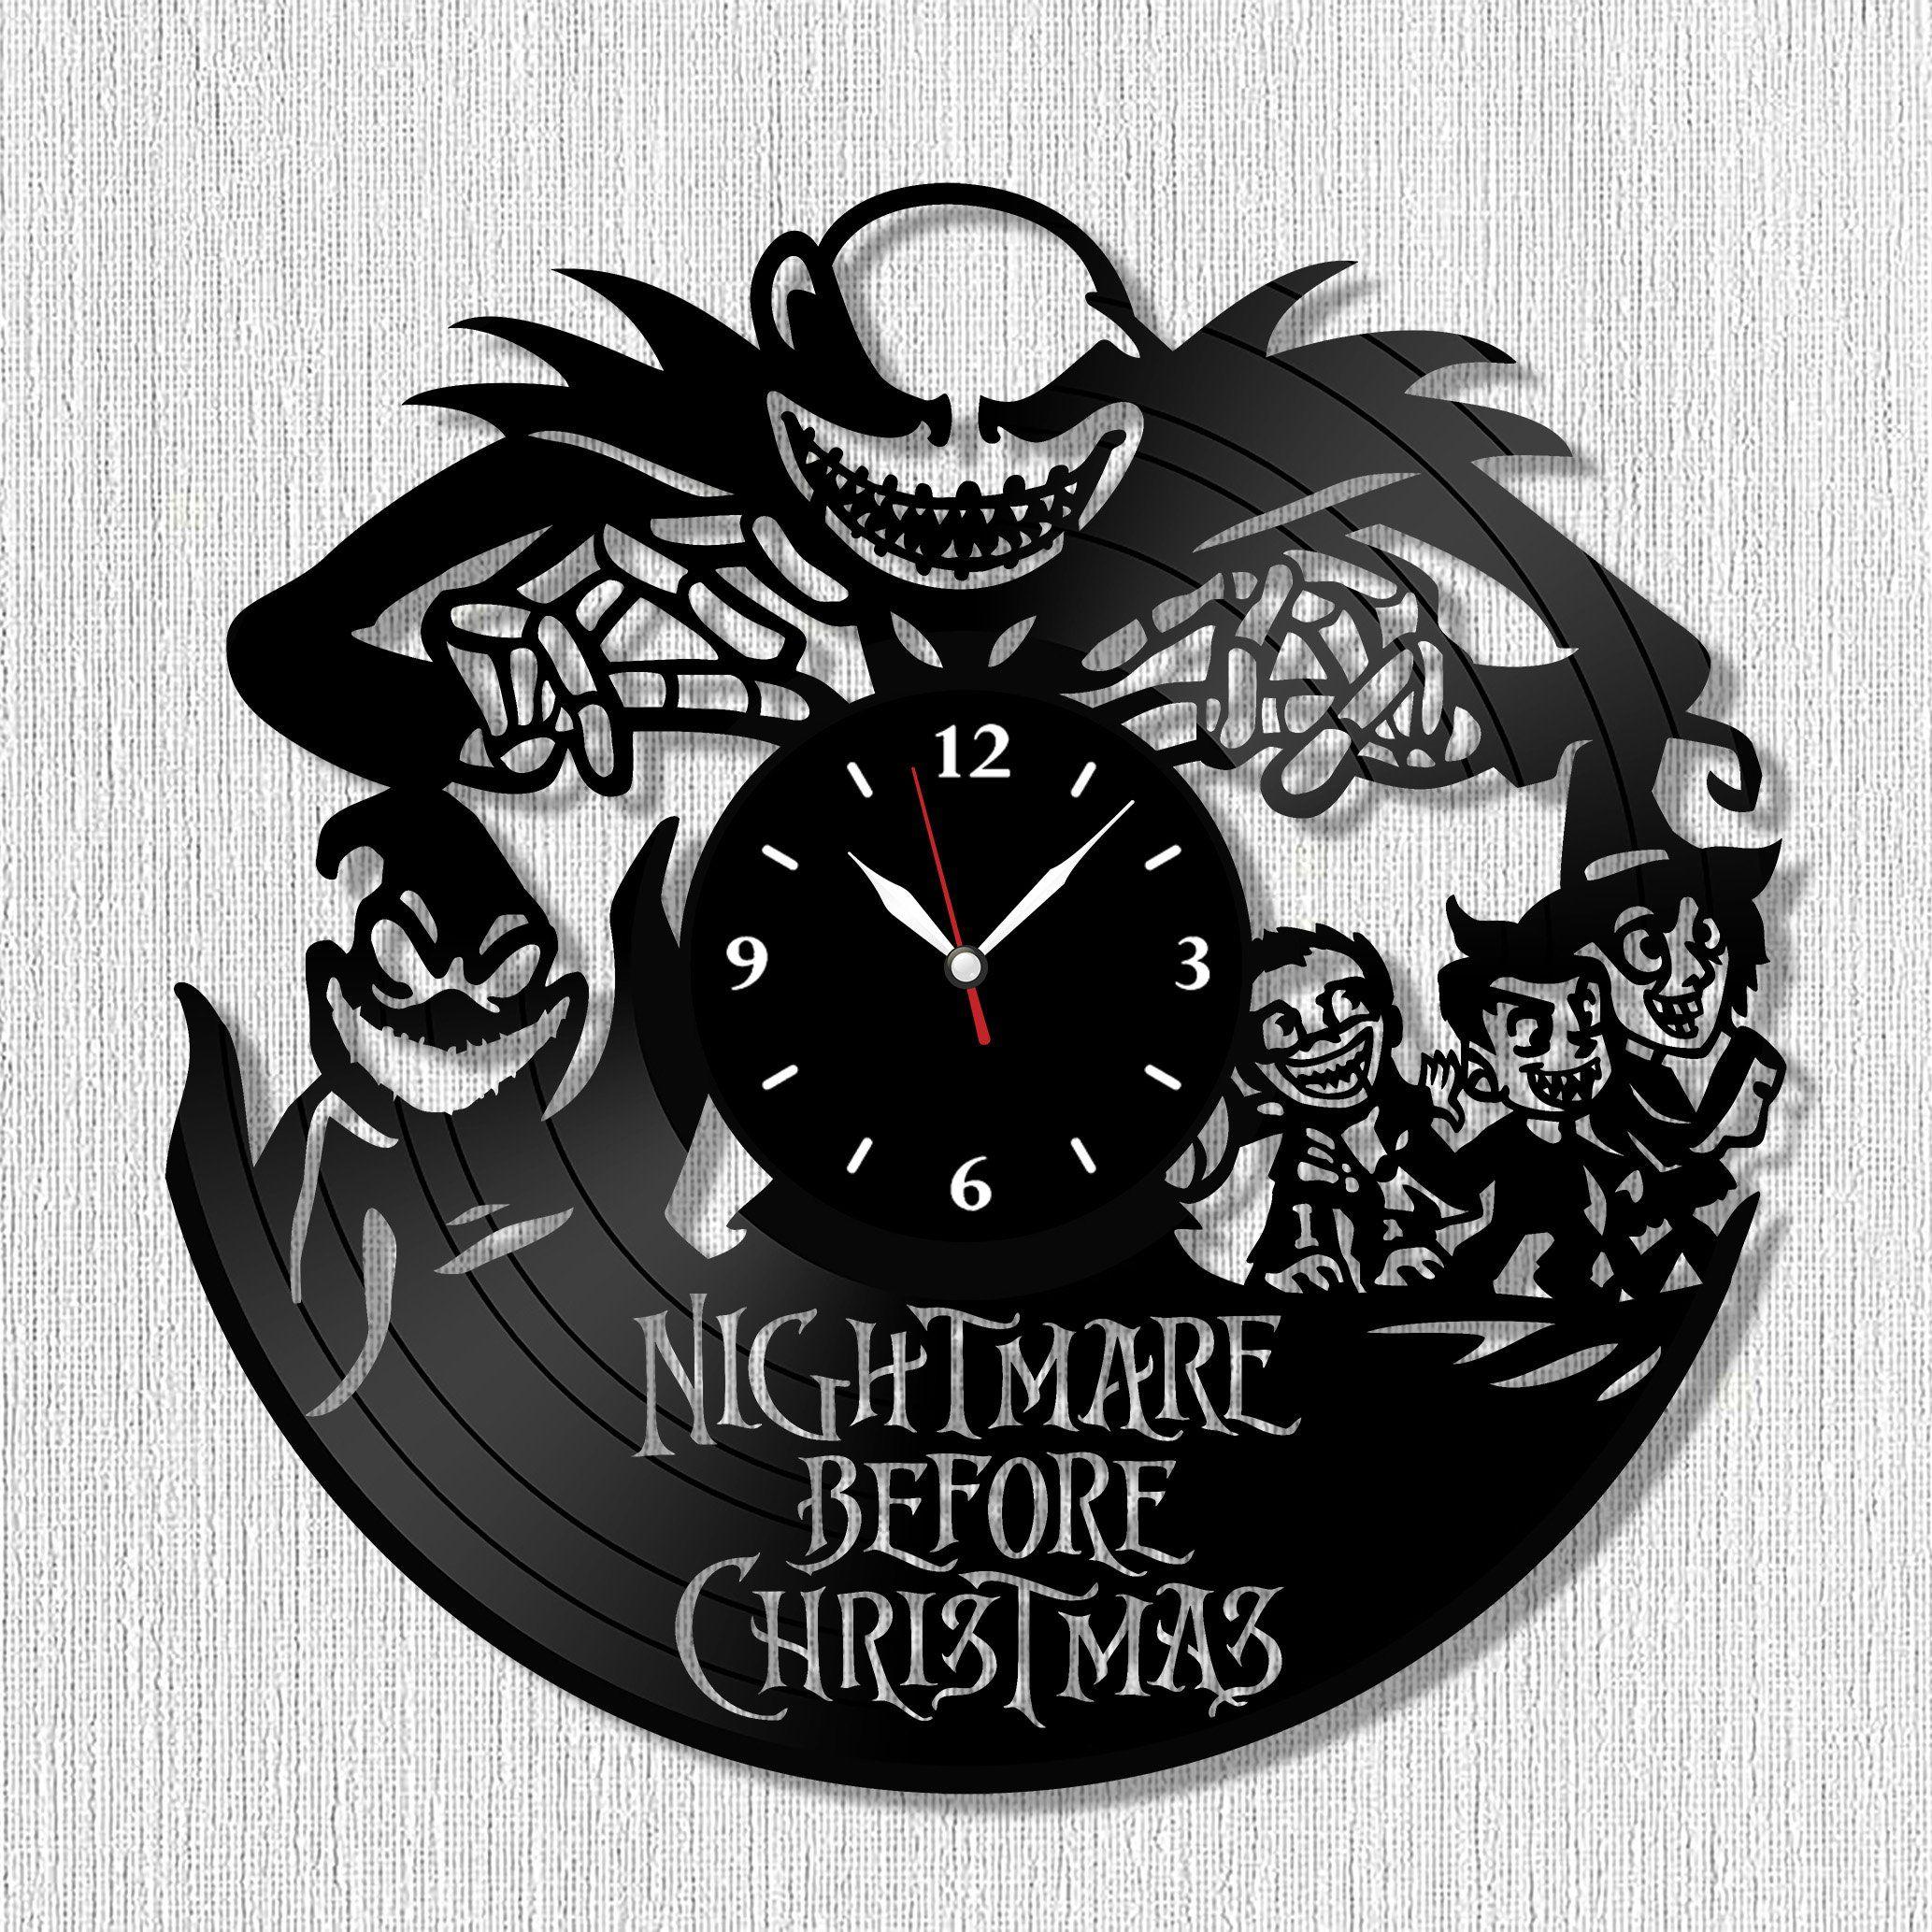 SofiClock Nightmare Before Christmas Vinyl Record Wall Clock 12 ...